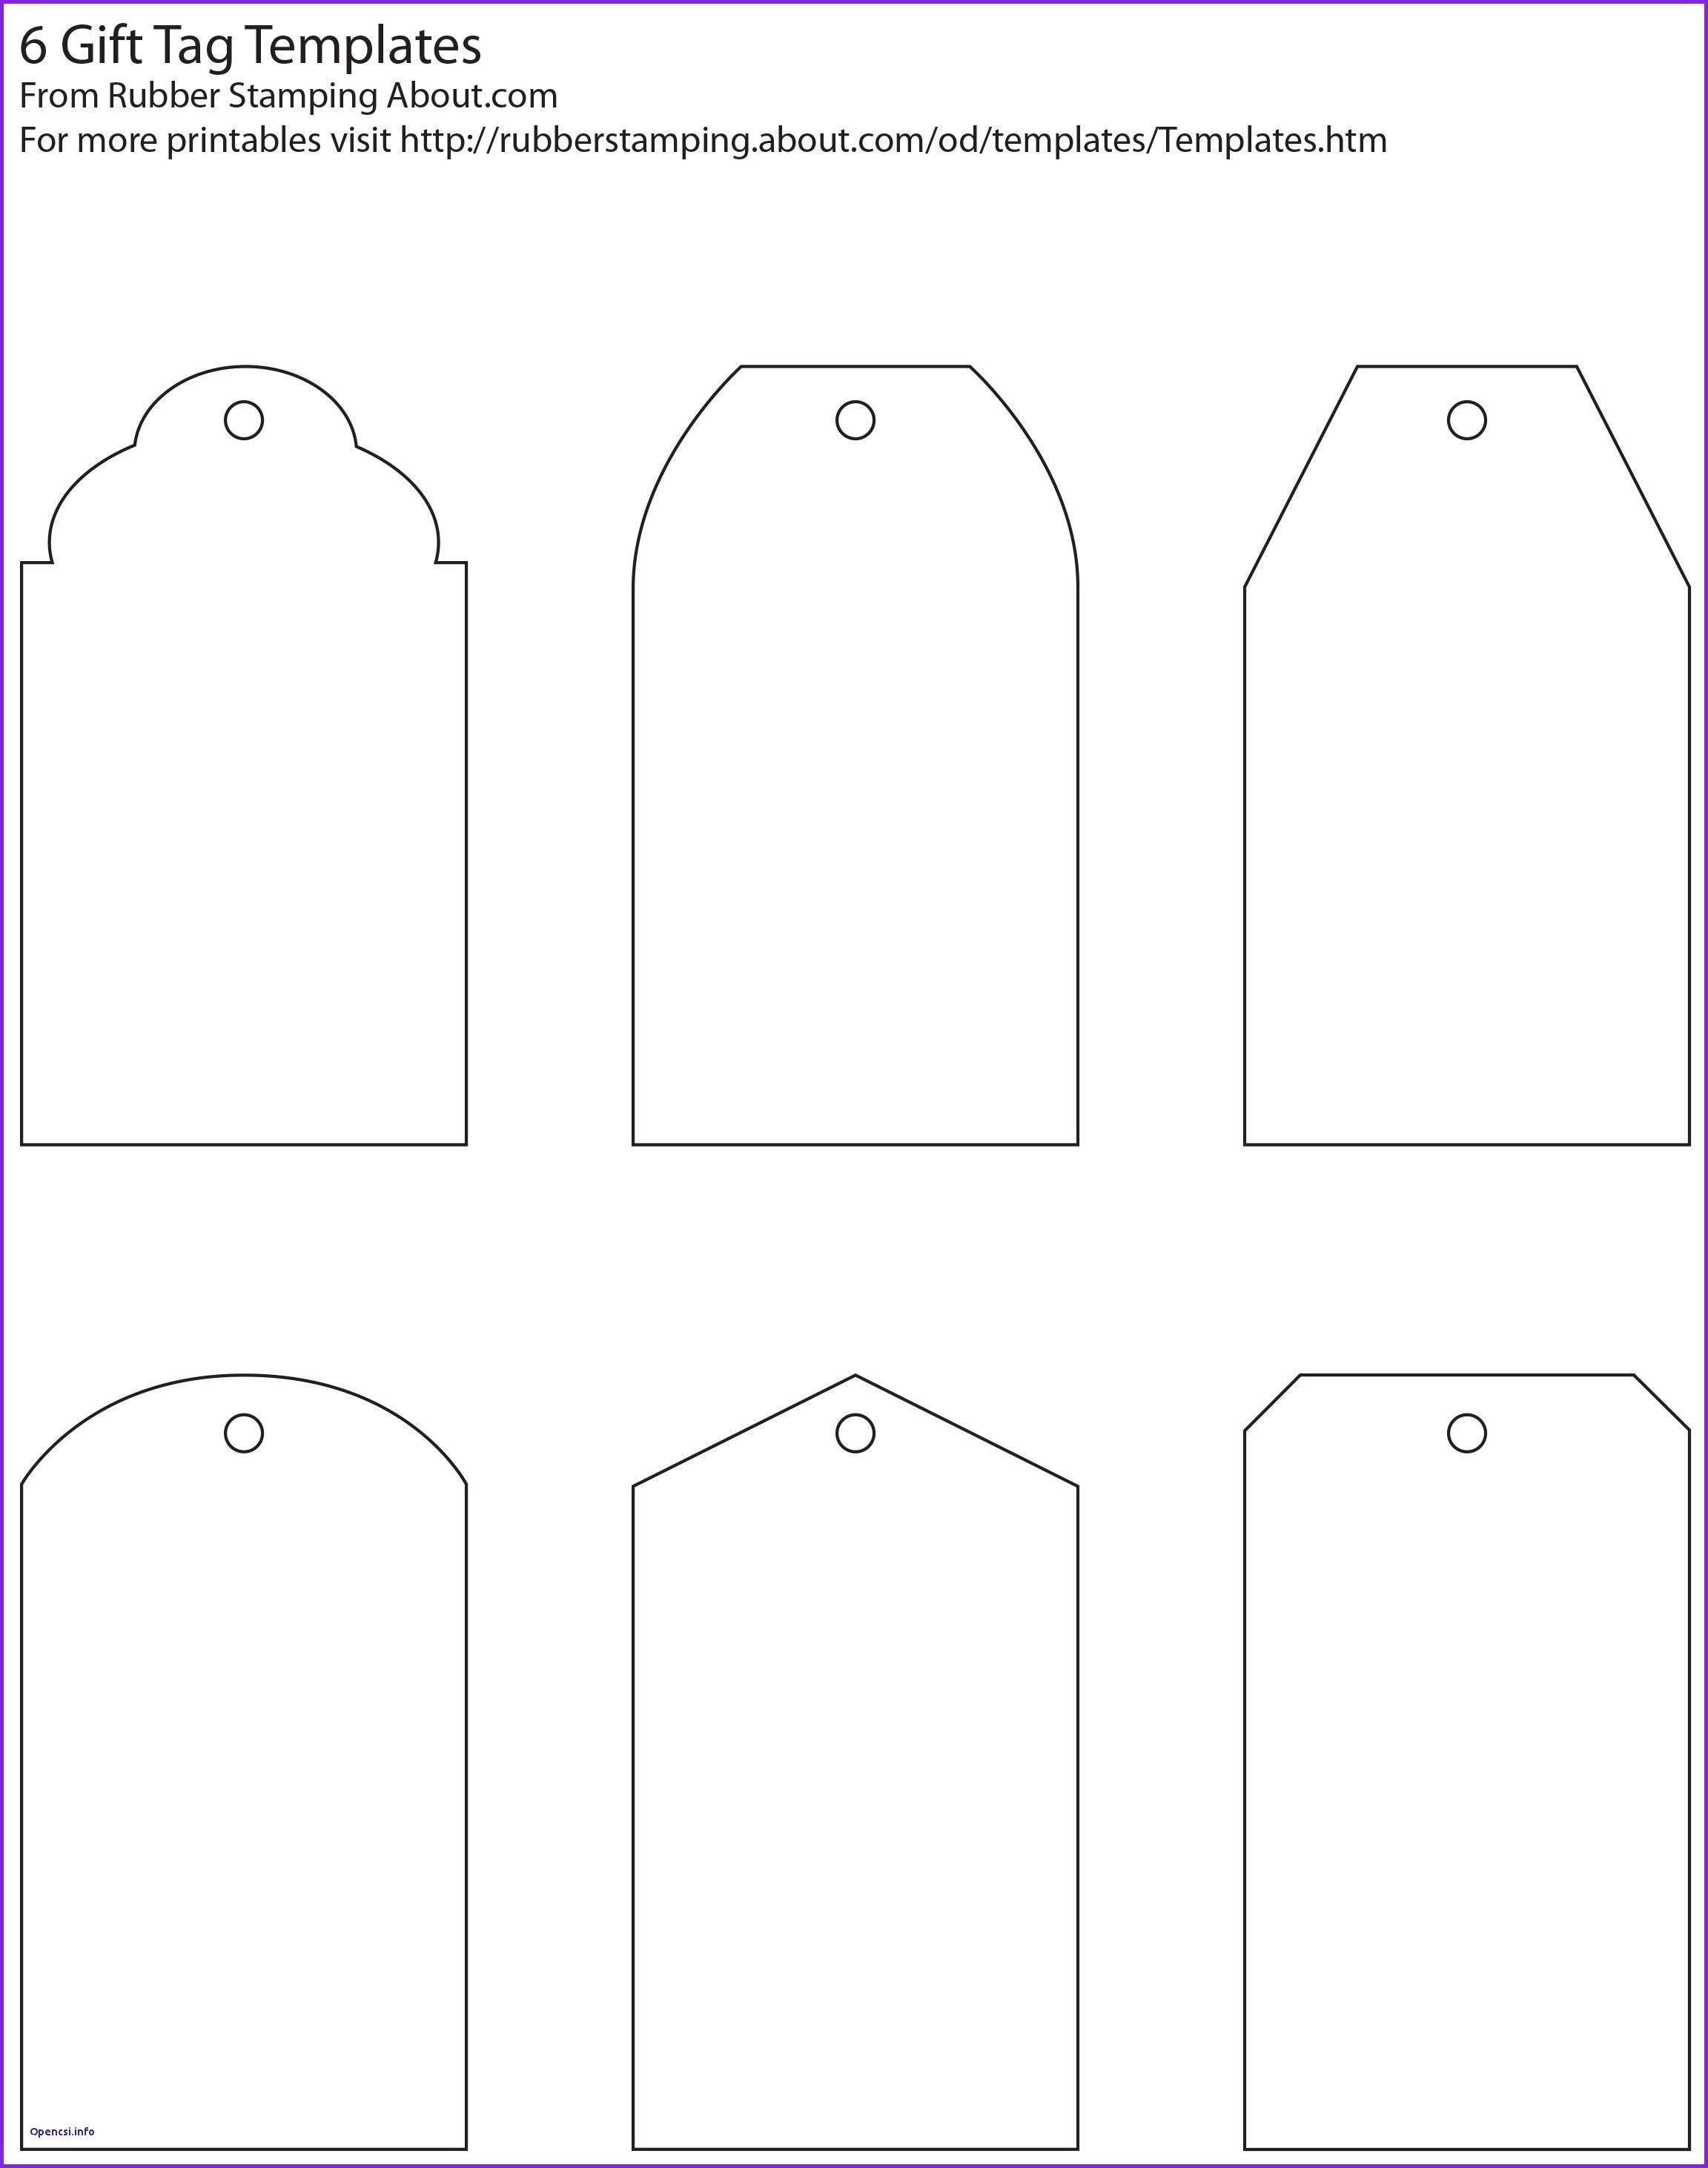 Design Return Address Labels Free Unique Avery Label Templates - Free Printable Address Labels